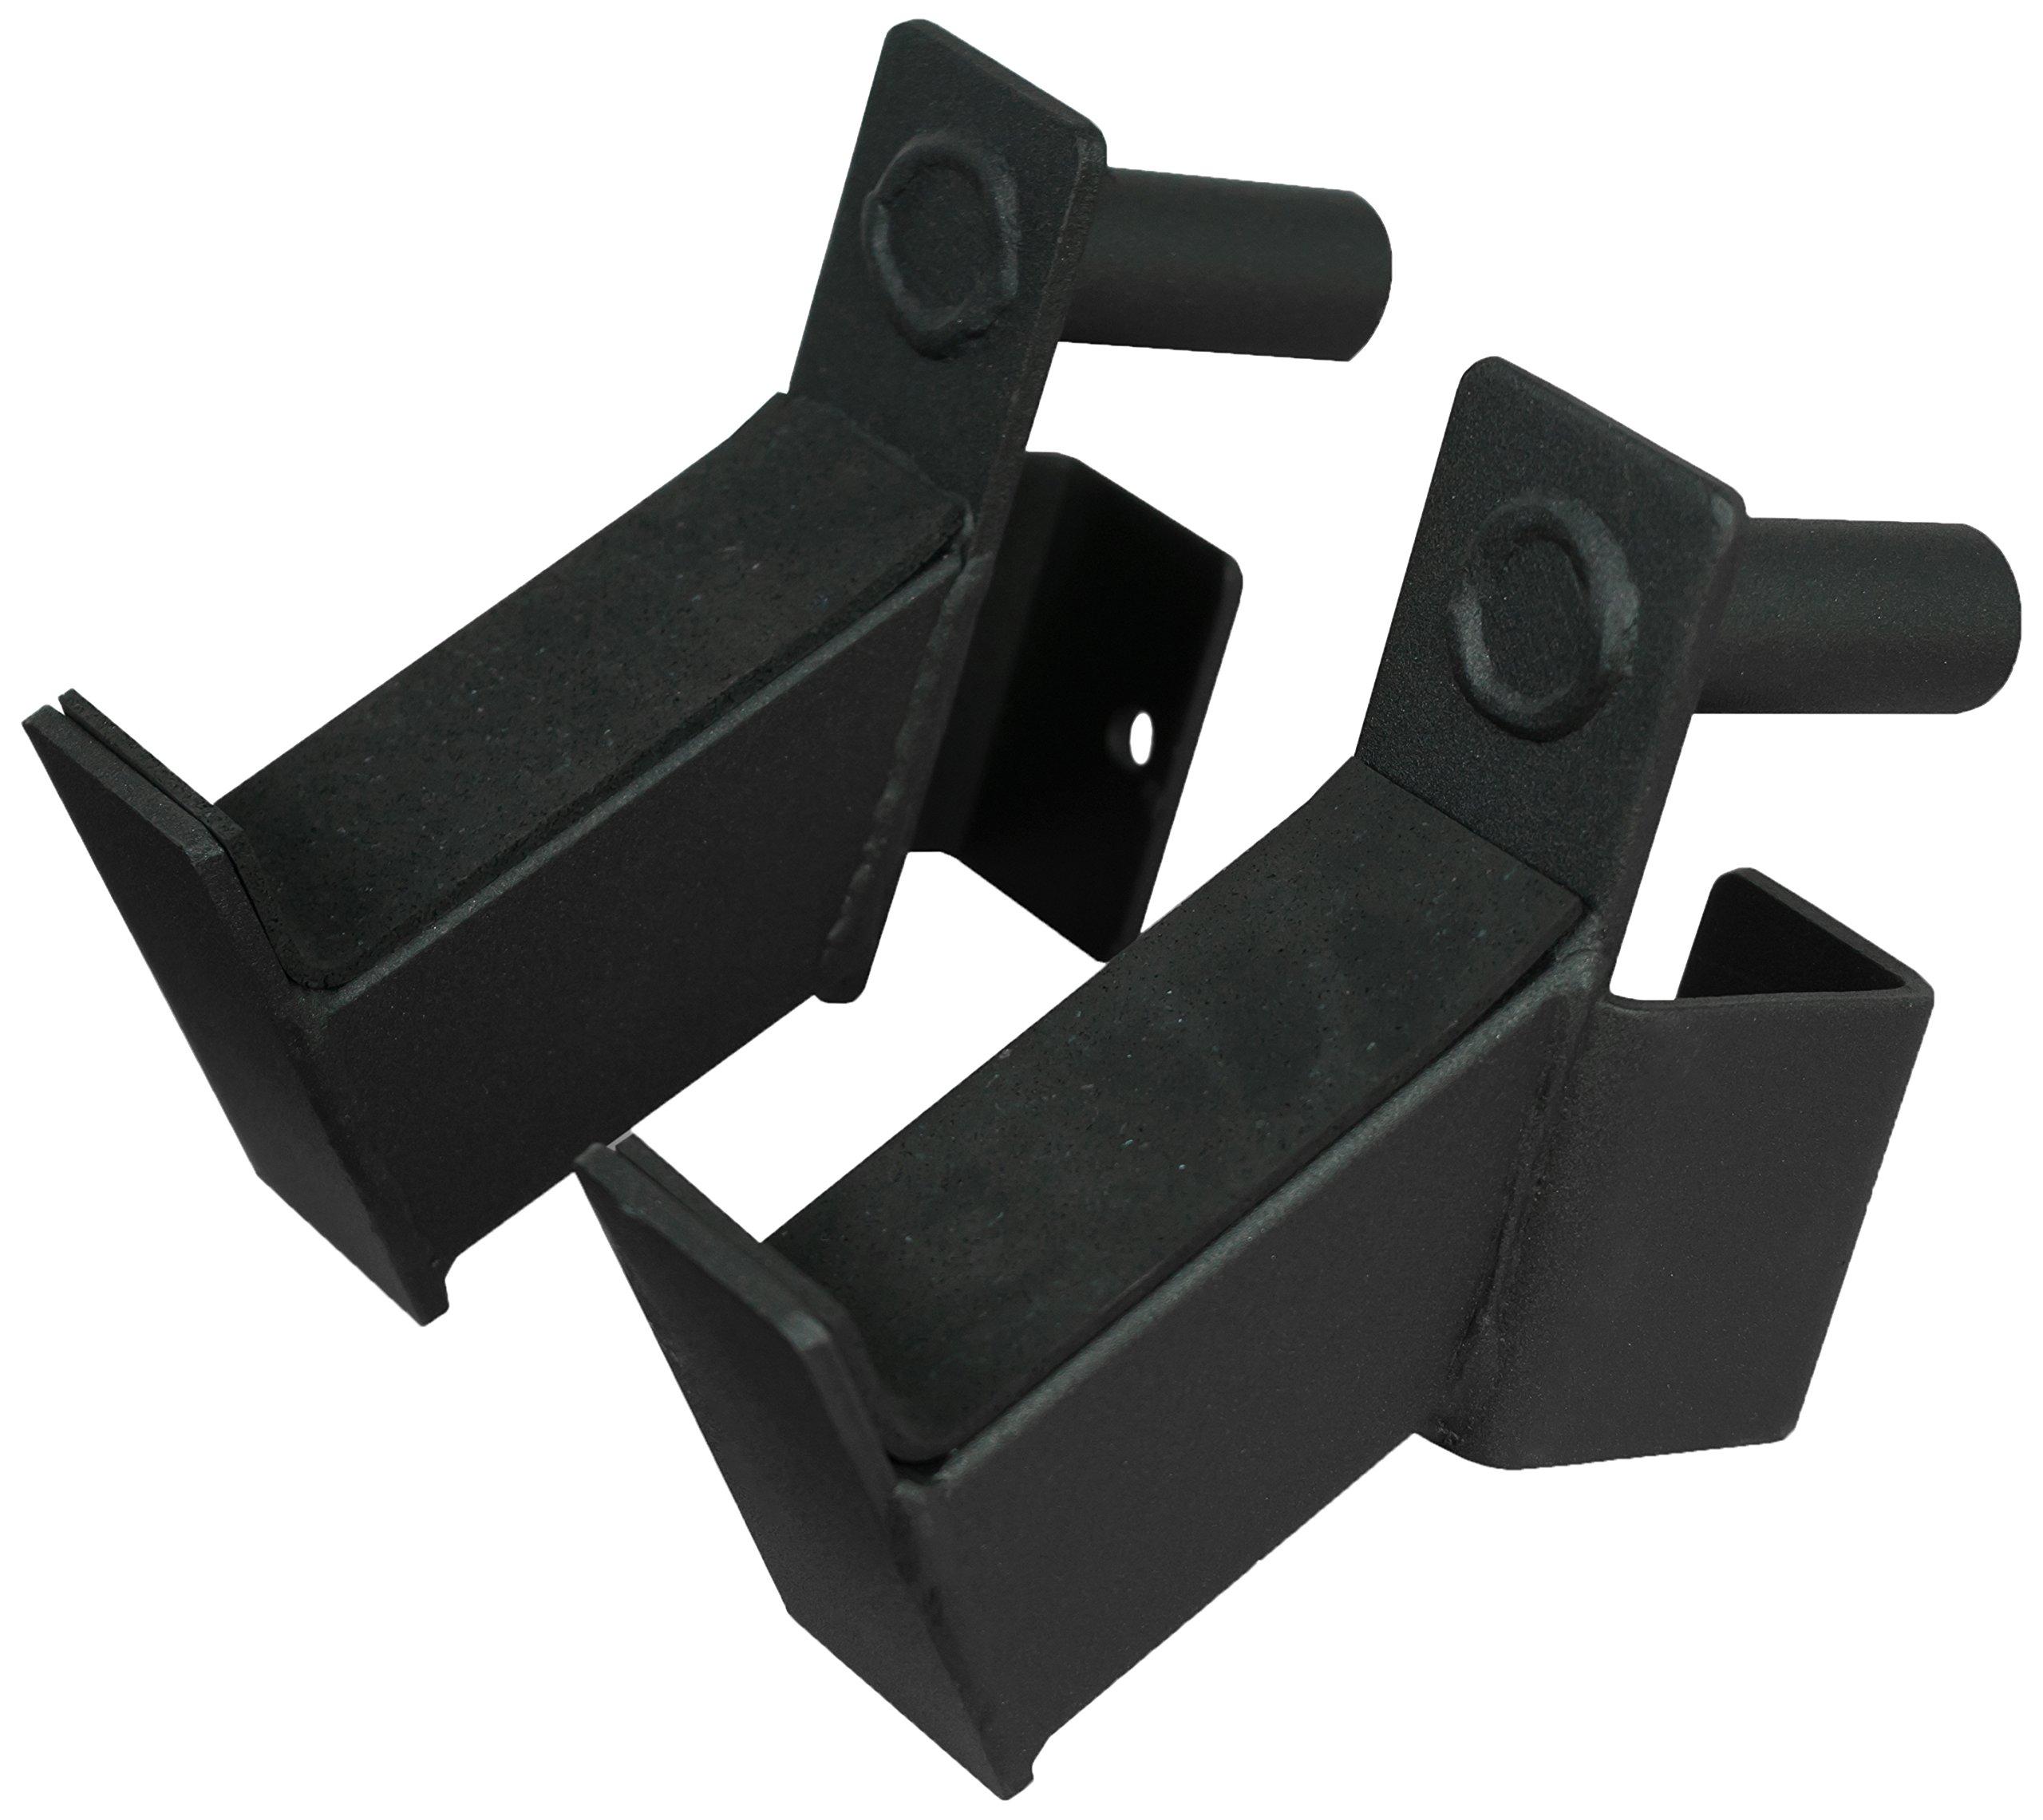 Valor Fitness MB-G Short Bar Holder Accessory Set for BD-11, BD-20 and BD-41 (fits 2.5'' tubing)